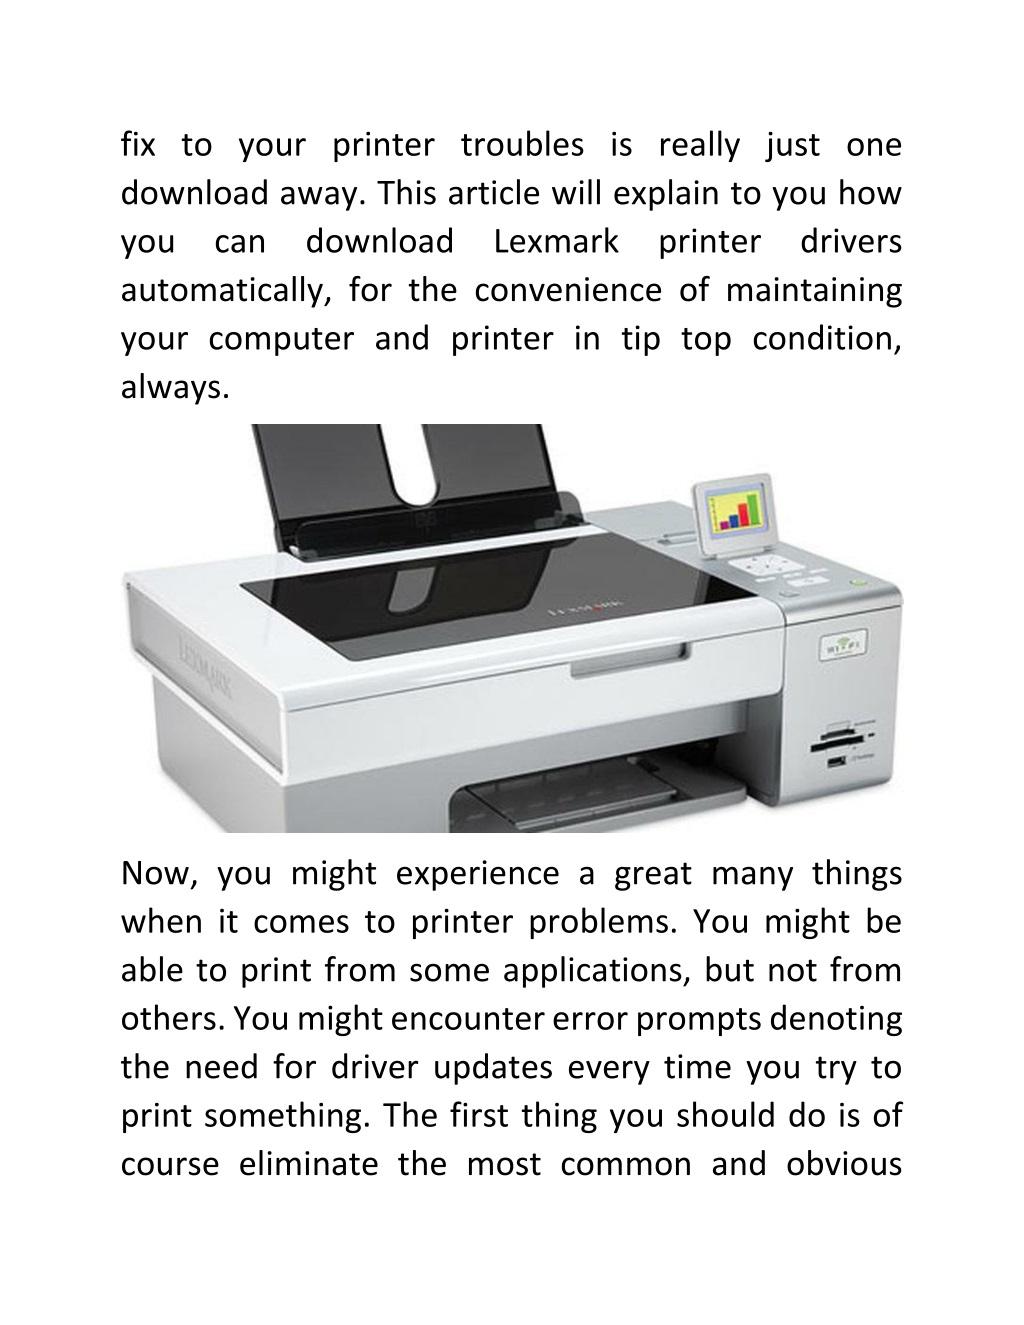 Lexmark printer drivers for mac